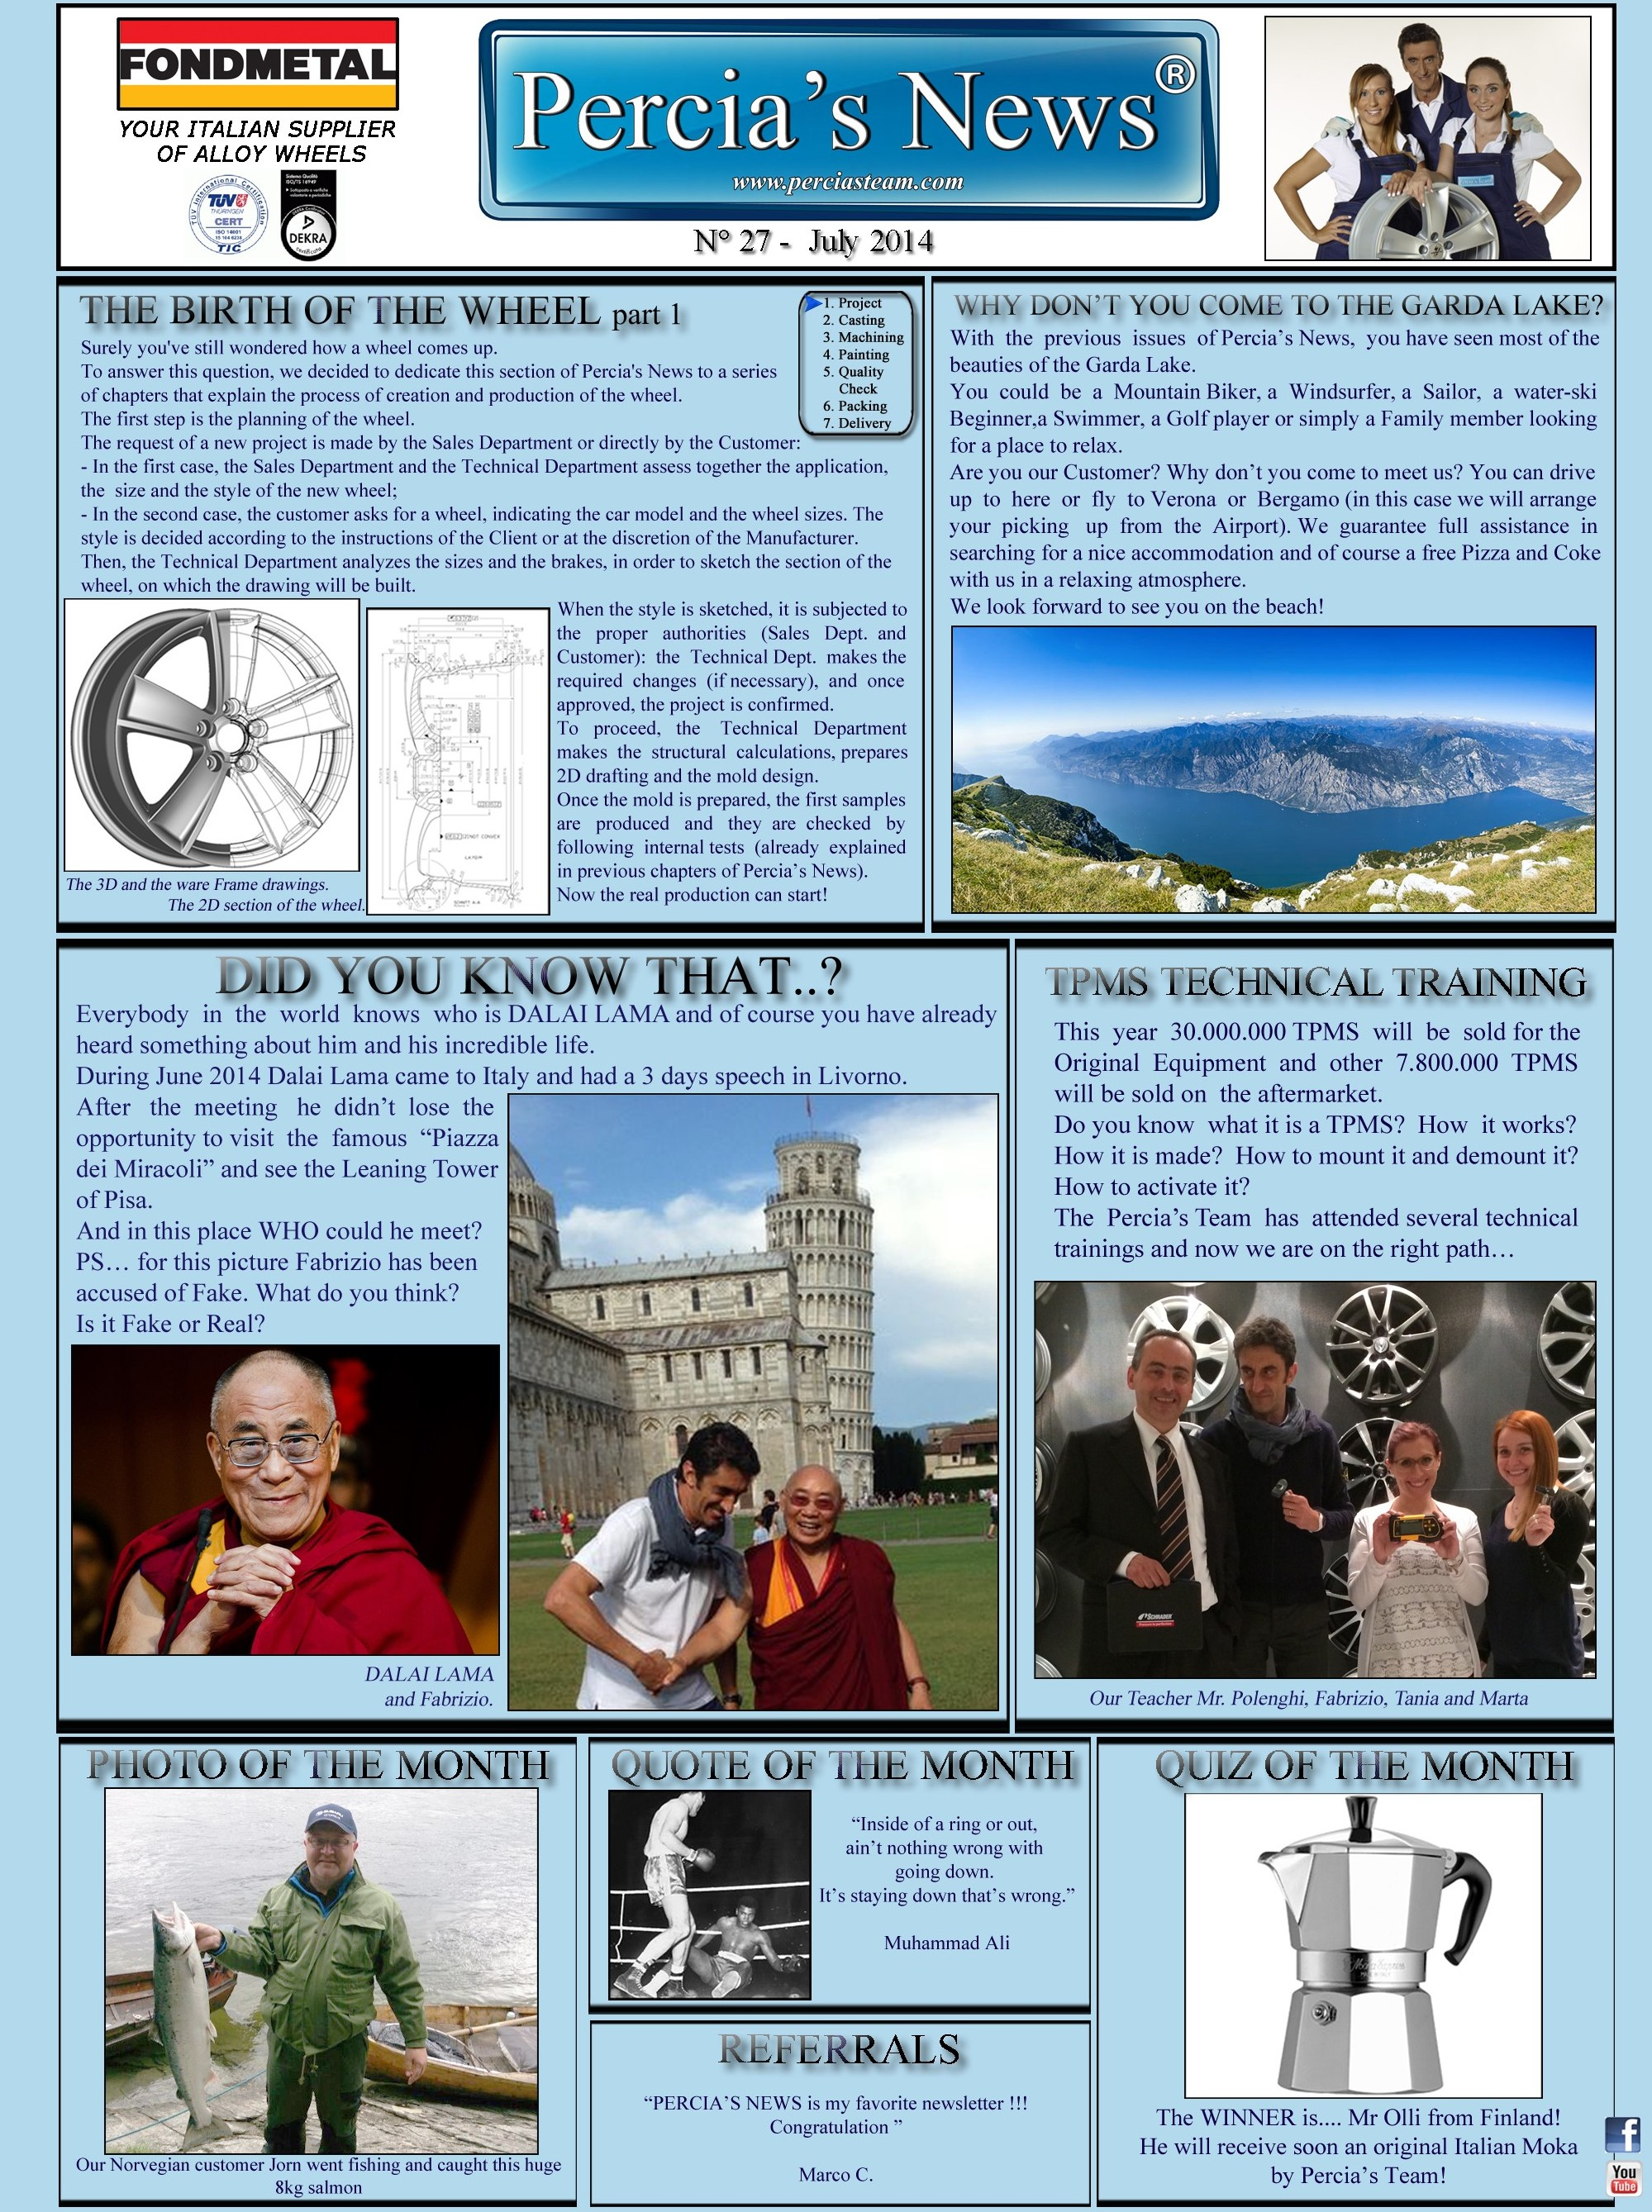 PERCIA'S NEWS JULY 2014